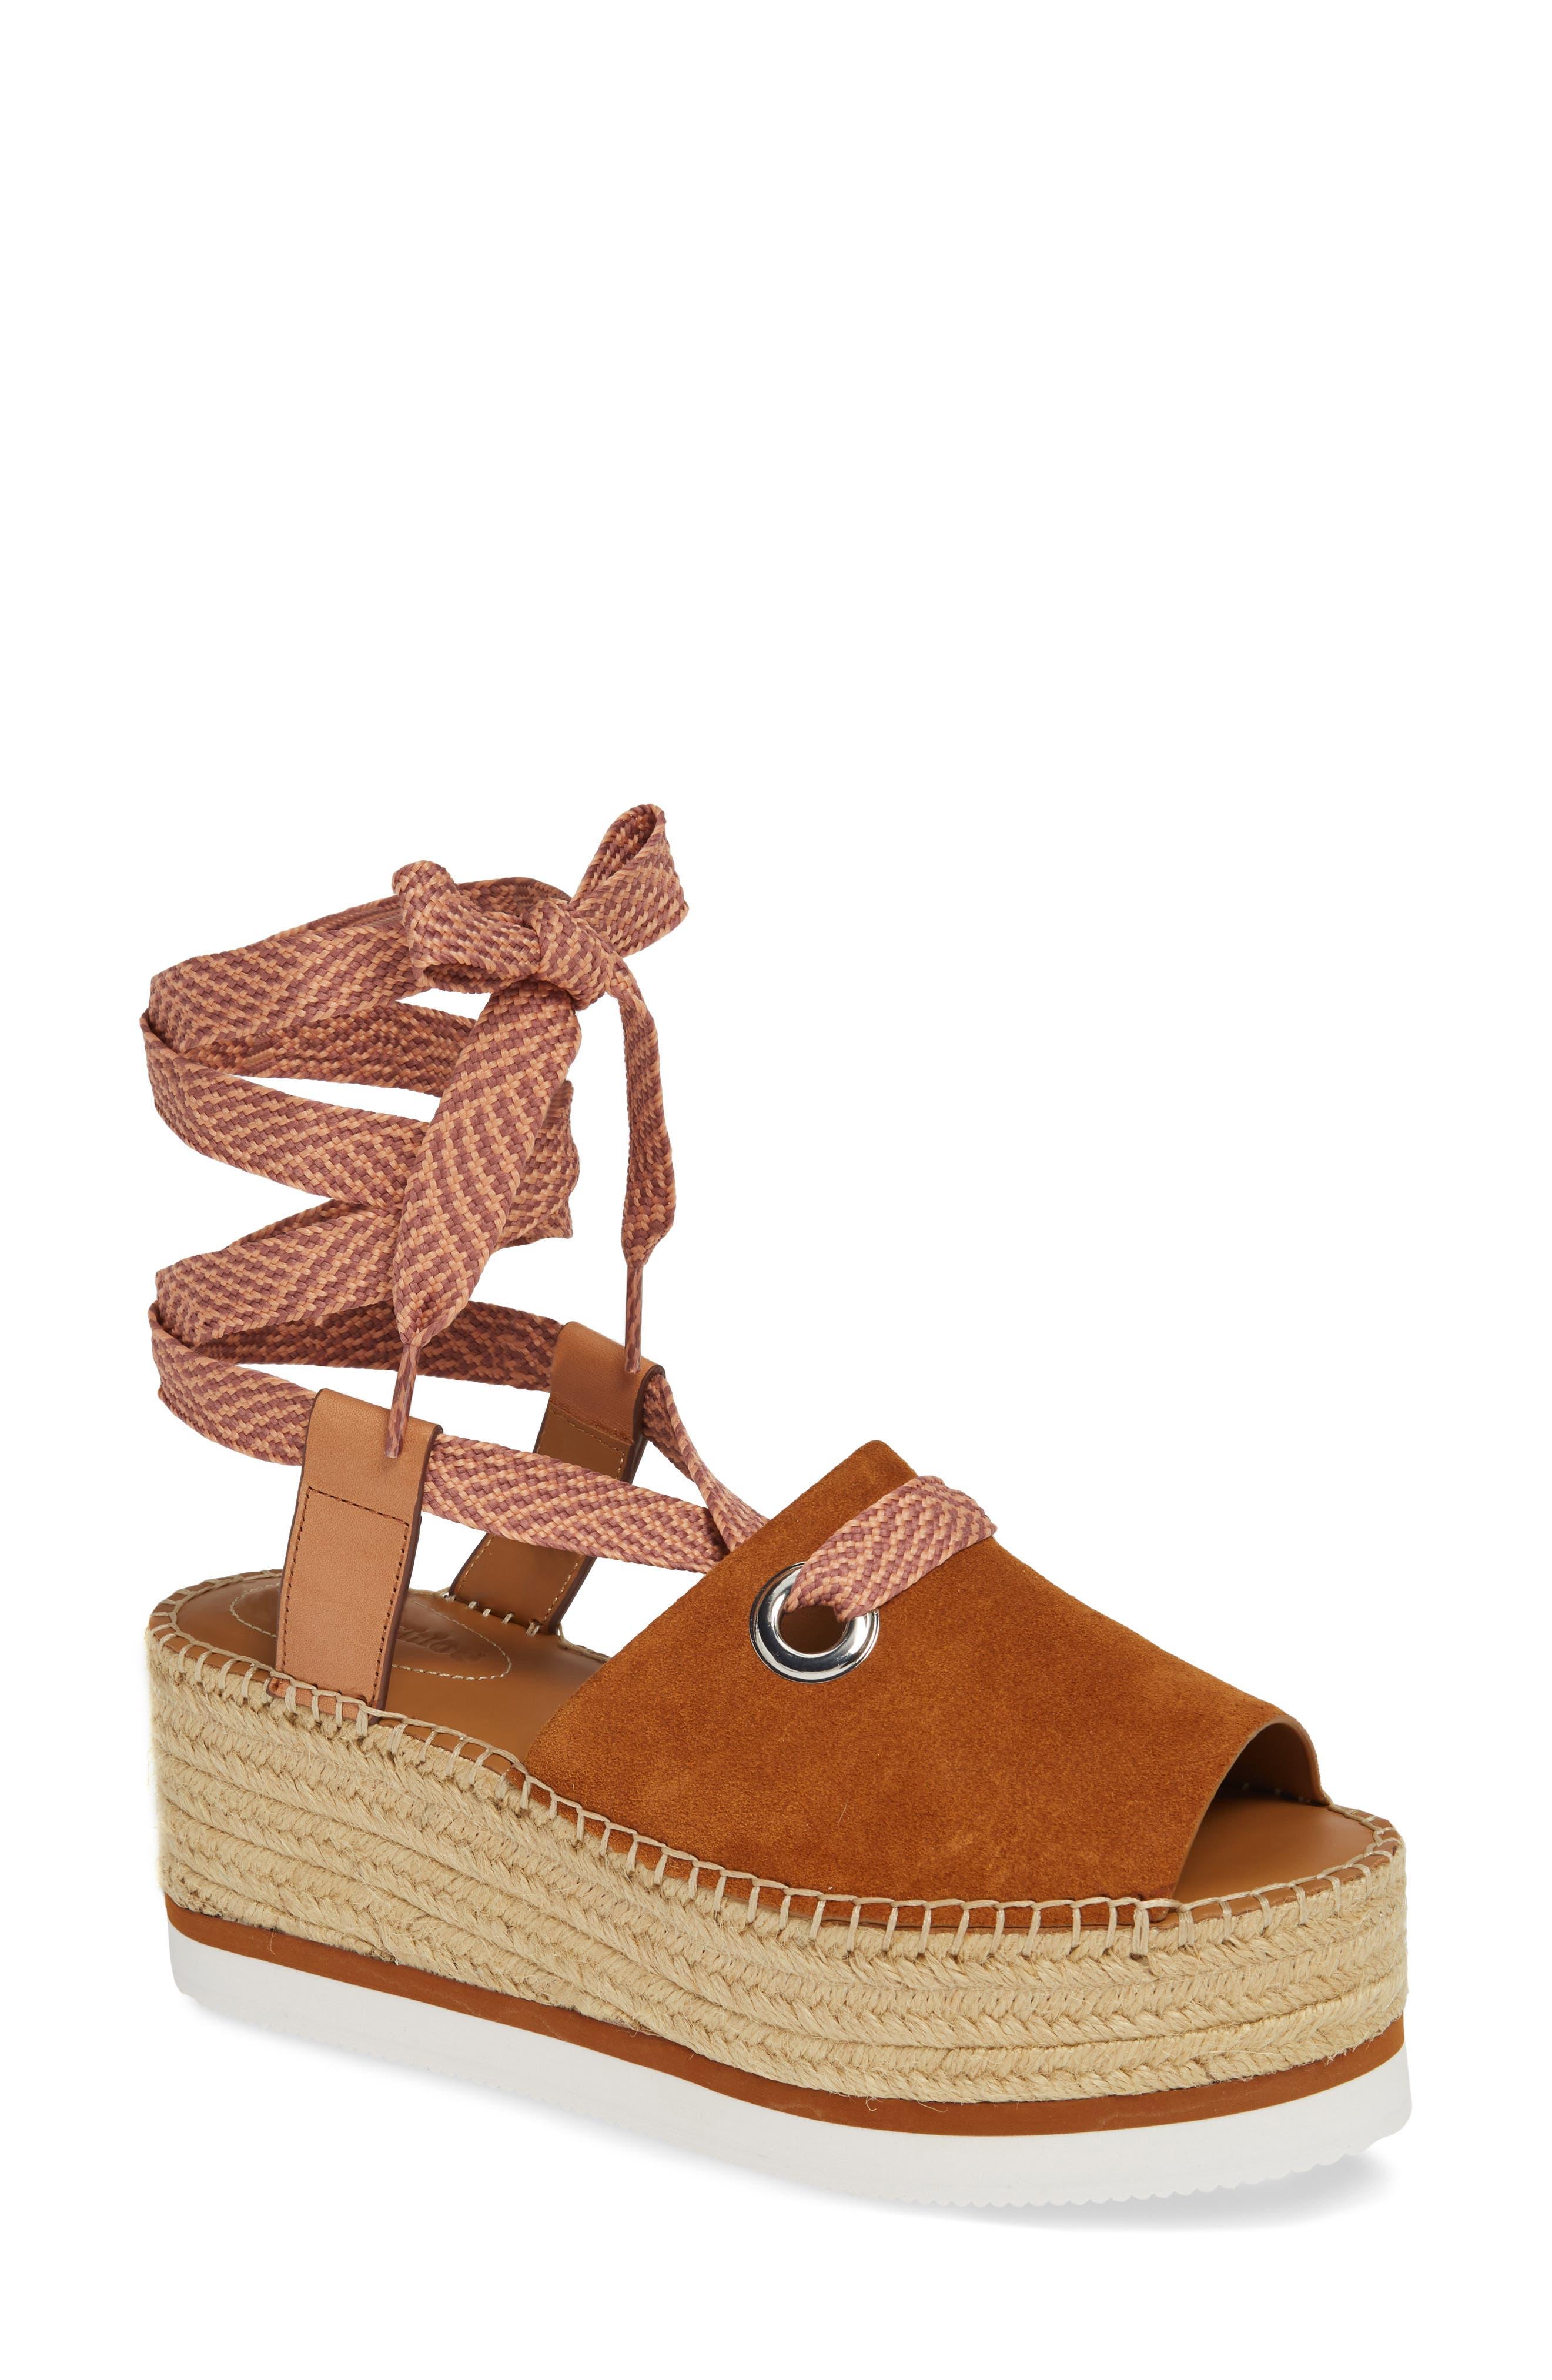 Glyn Amber Platform Ankle Wrap Sandal,                             Main thumbnail 1, color,                             TAN